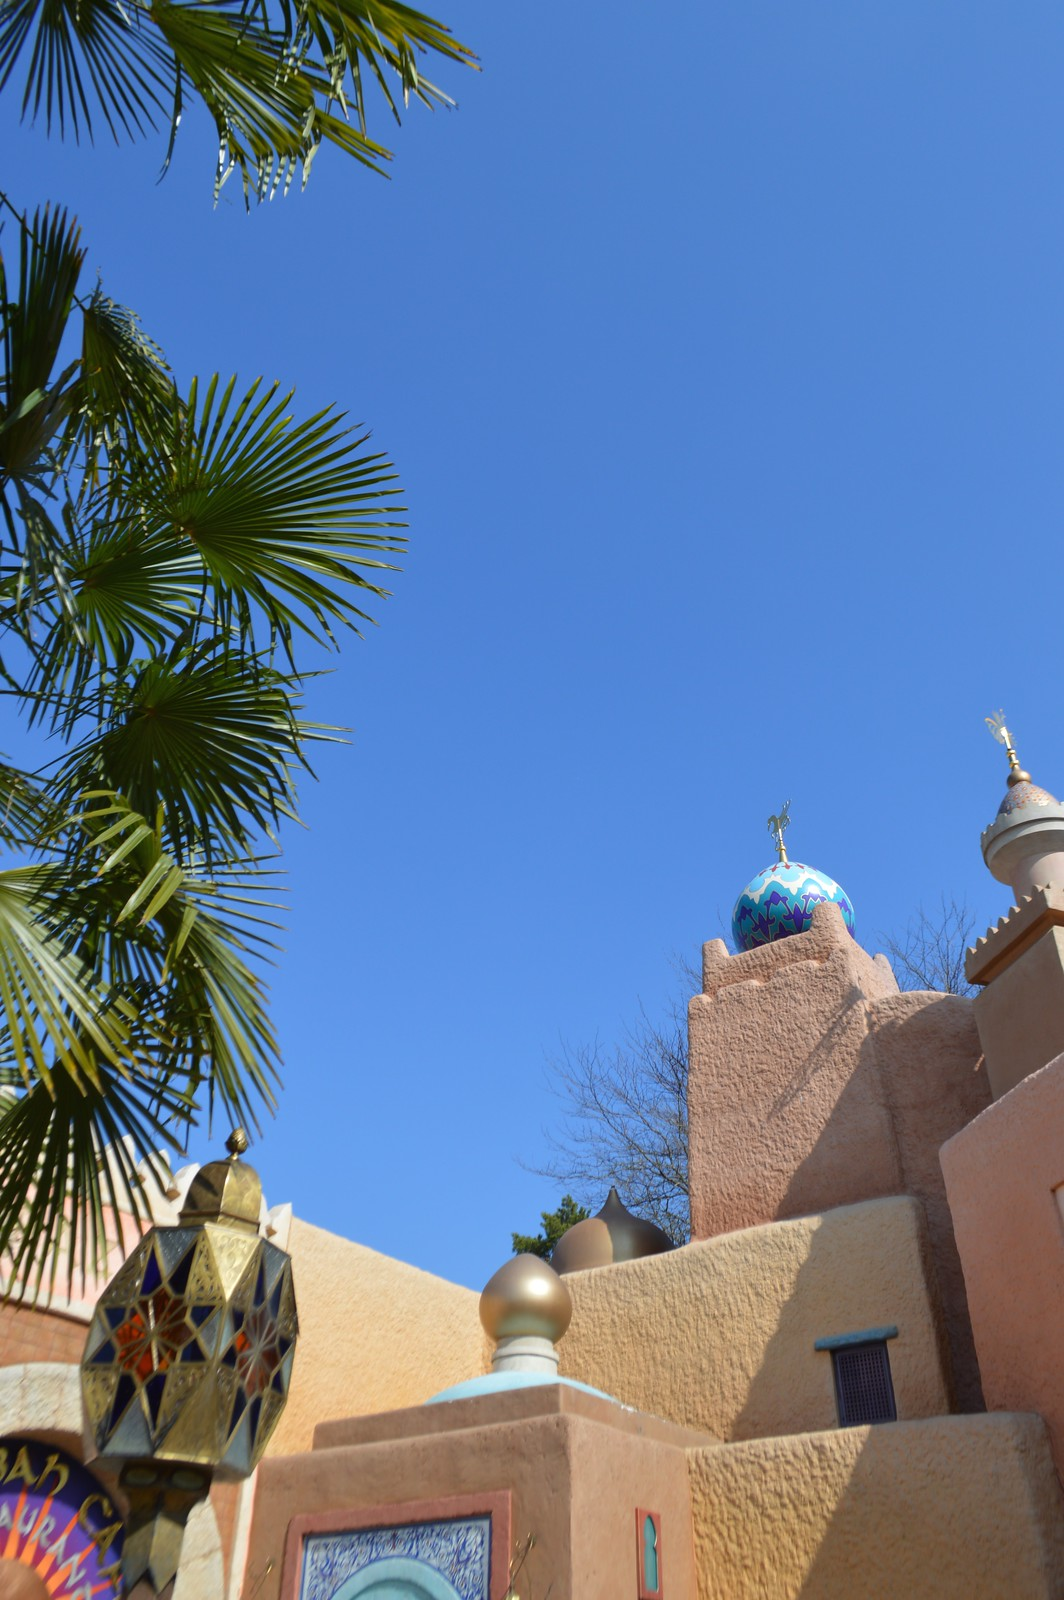 This is a picture of the Disneyland Paris Adventureland